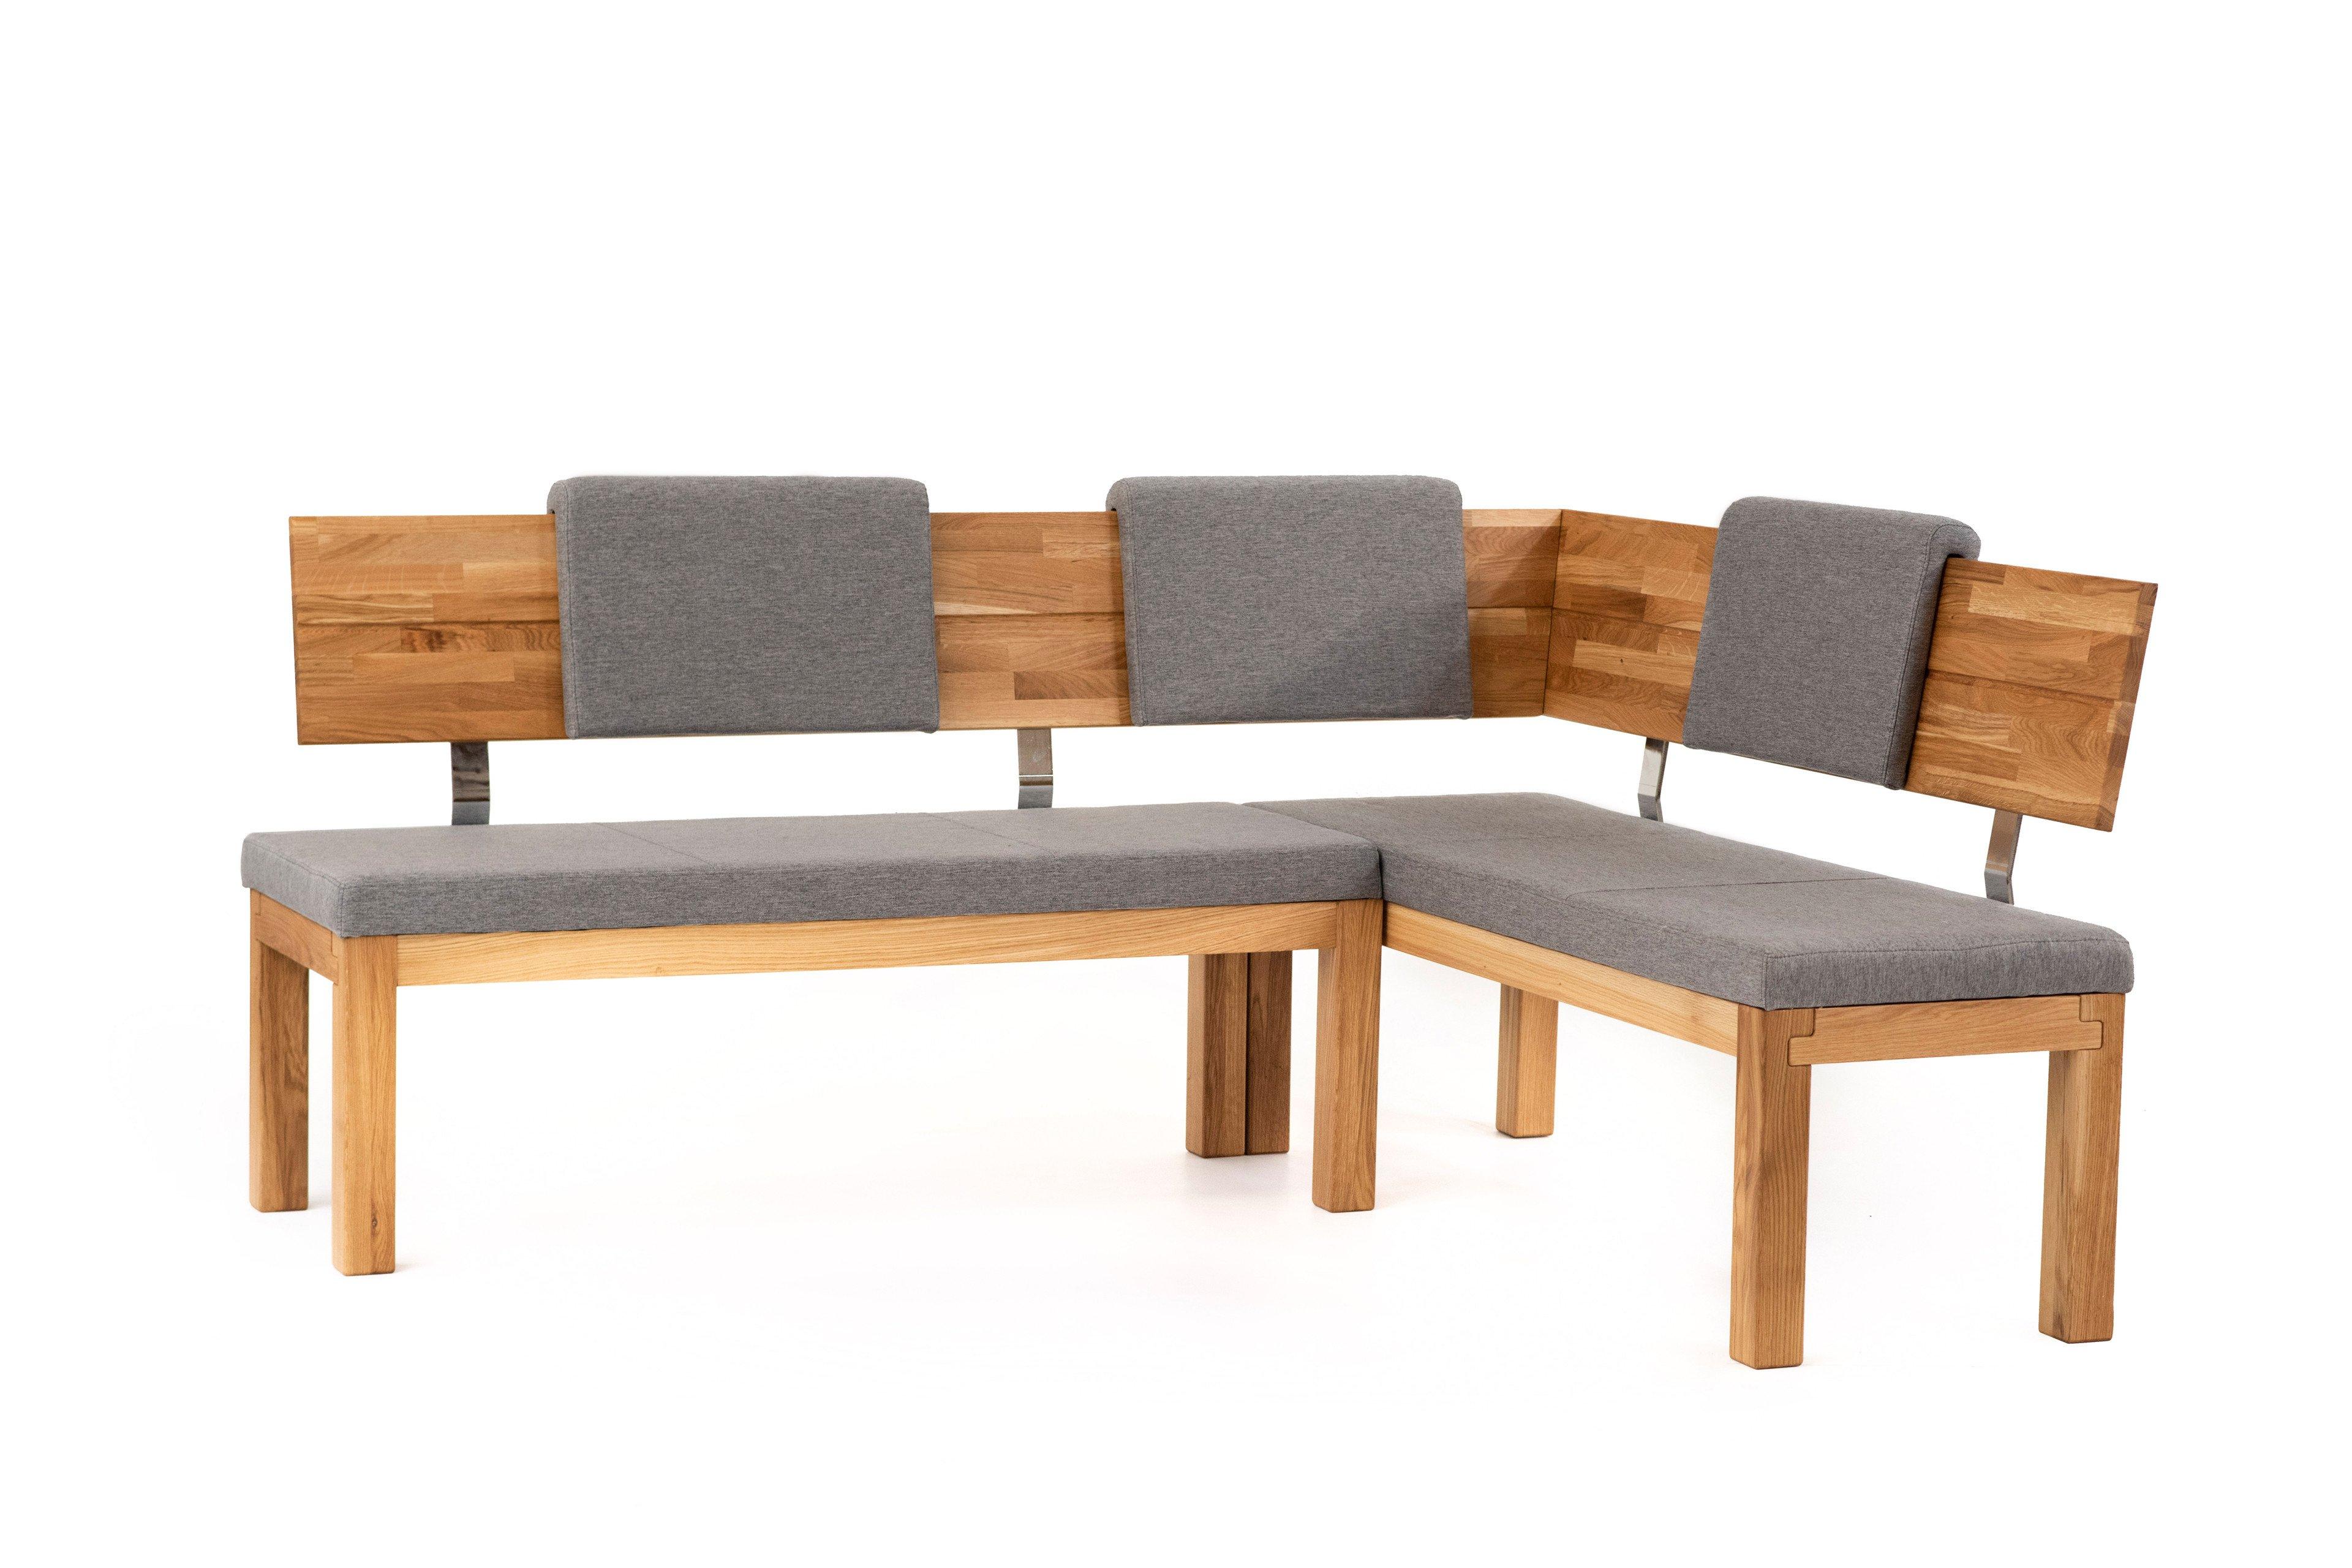 Catania Von Standard Furniture   Eckbank Kernbuche/ Dunkelbraun